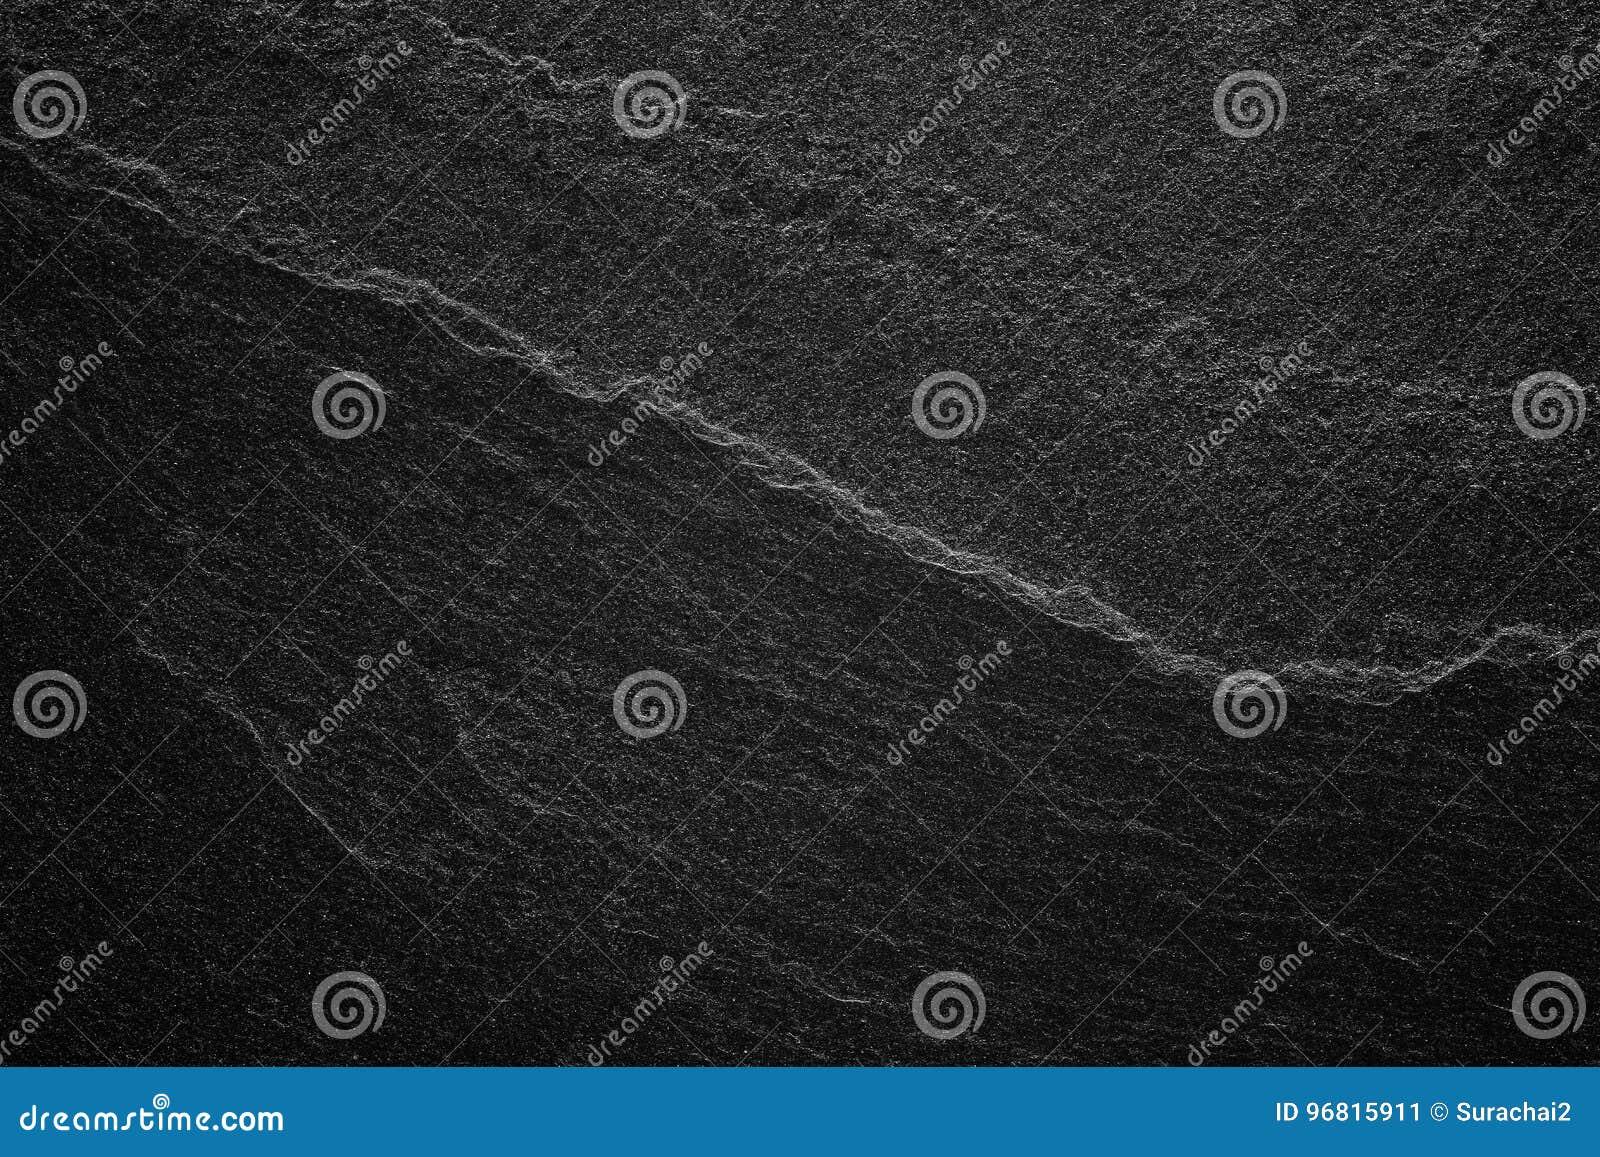 gris hq fondo negro - photo #49